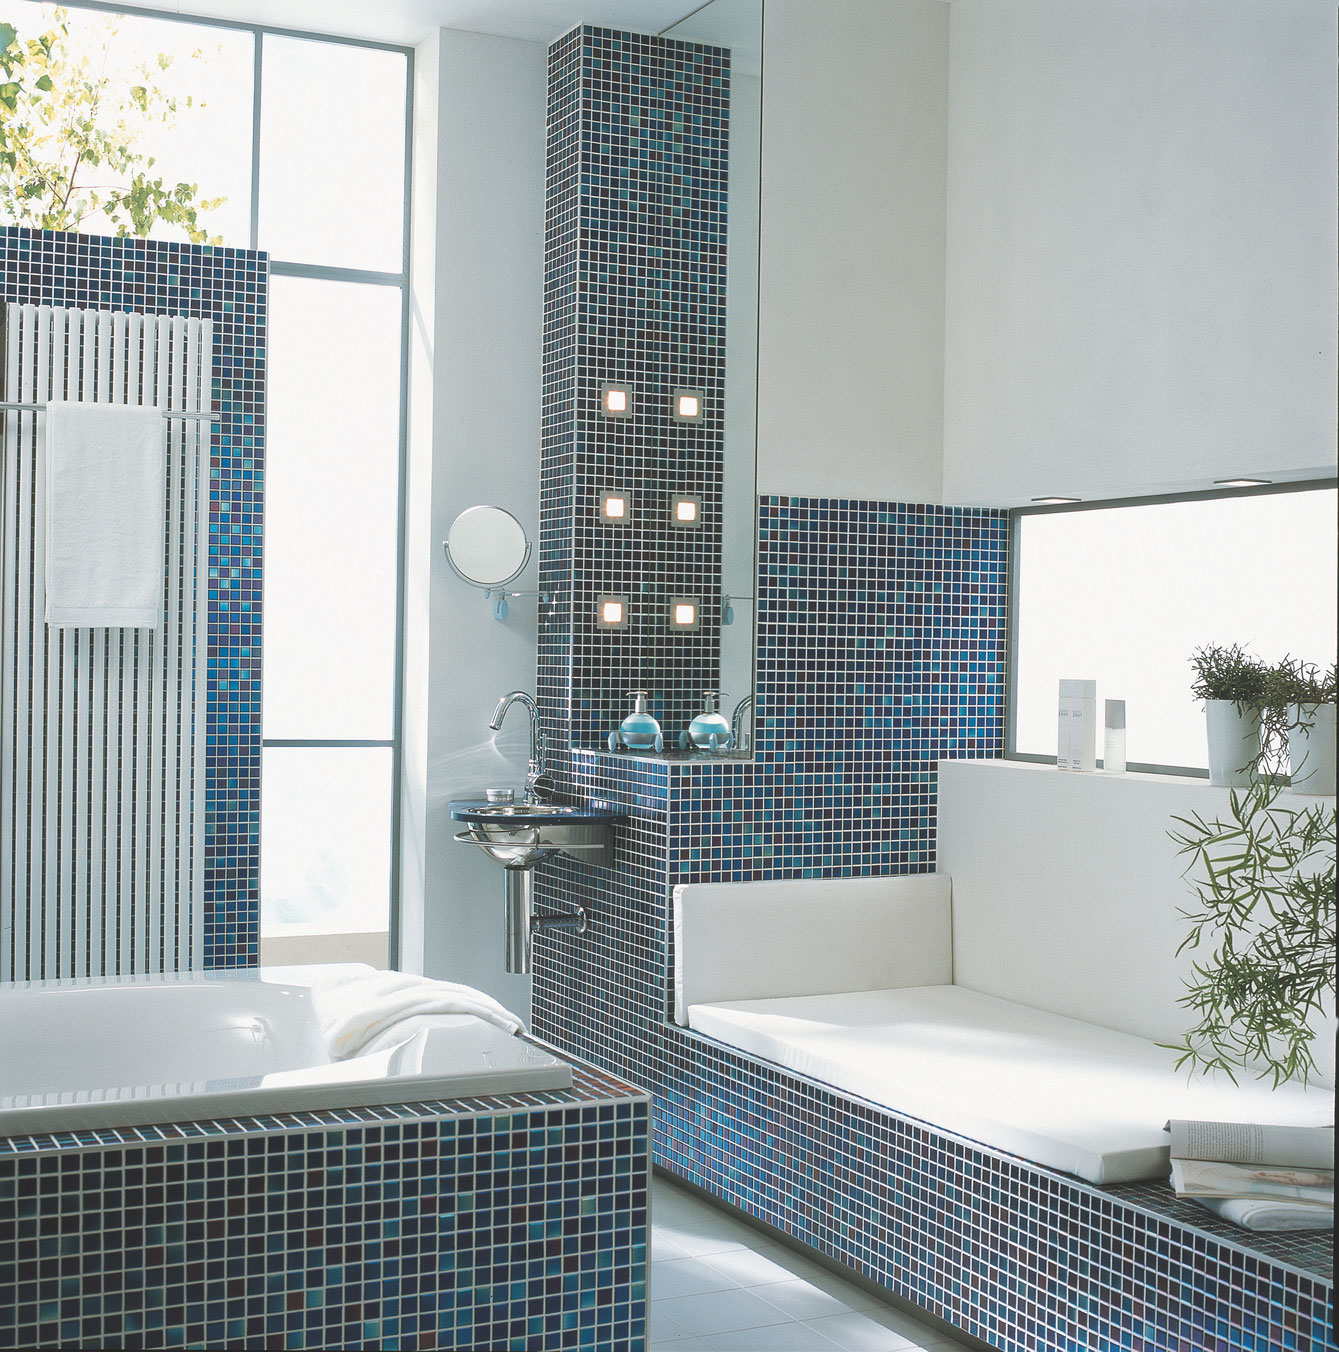 galerie besst fliesenleger fach betrieb. Black Bedroom Furniture Sets. Home Design Ideas